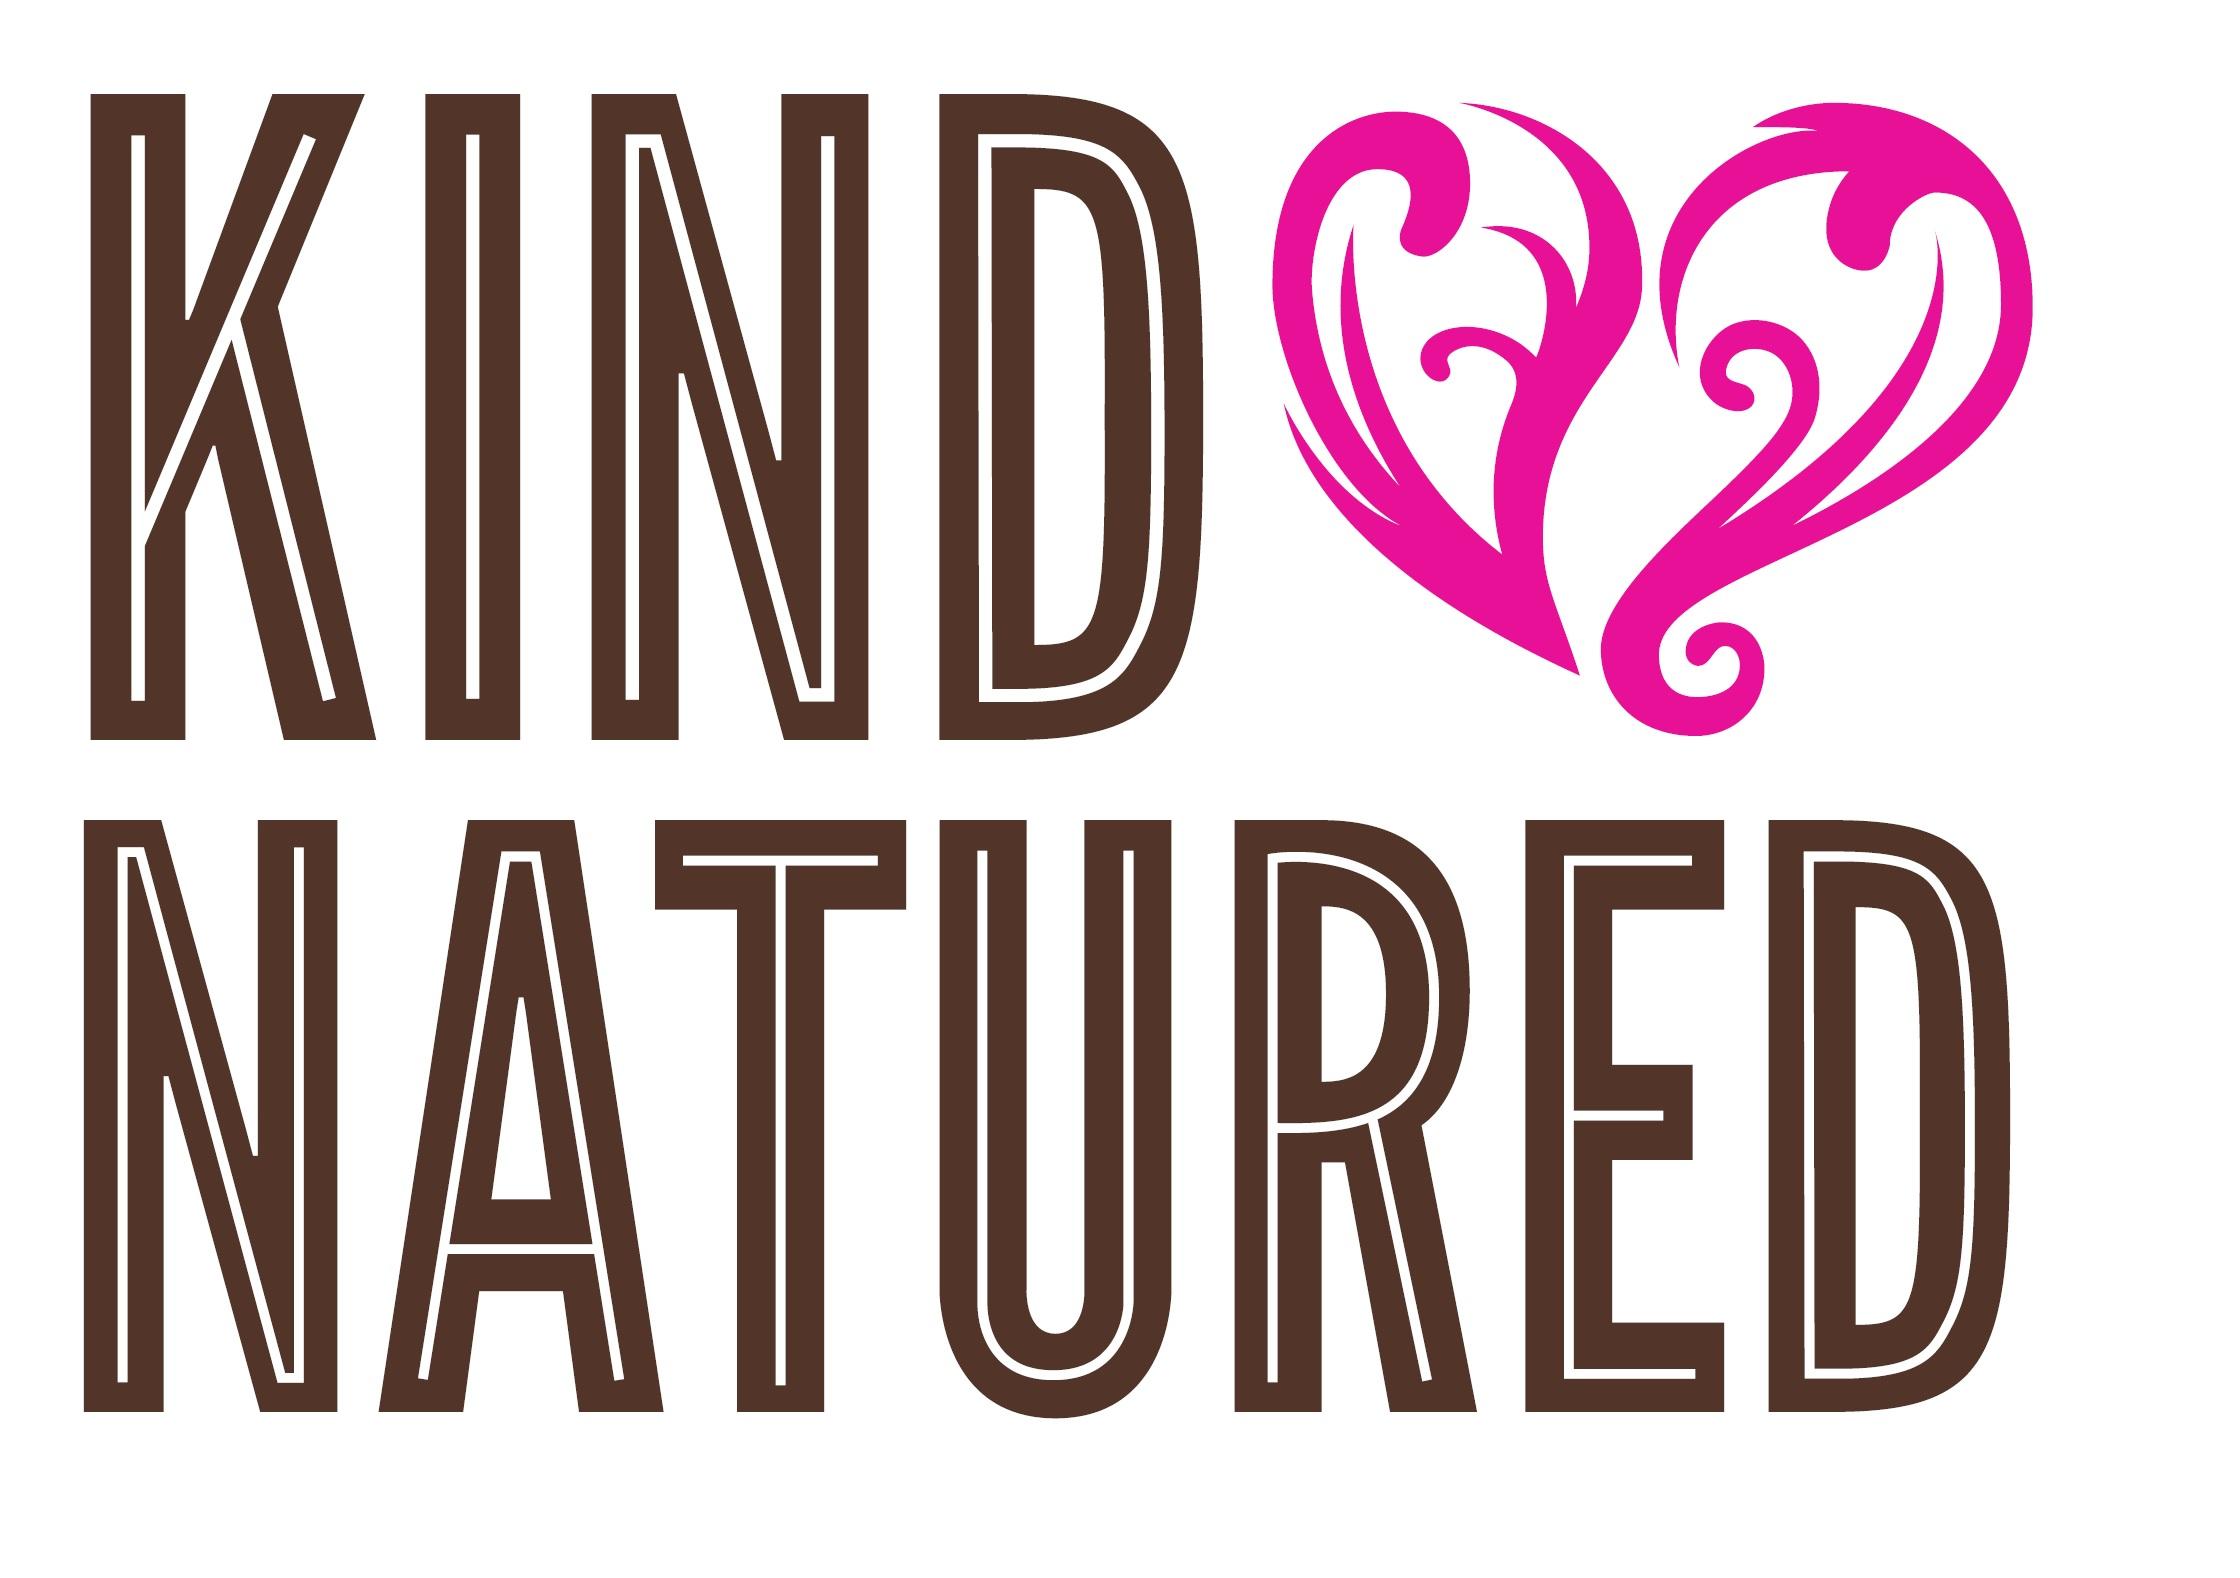 Kind Natured